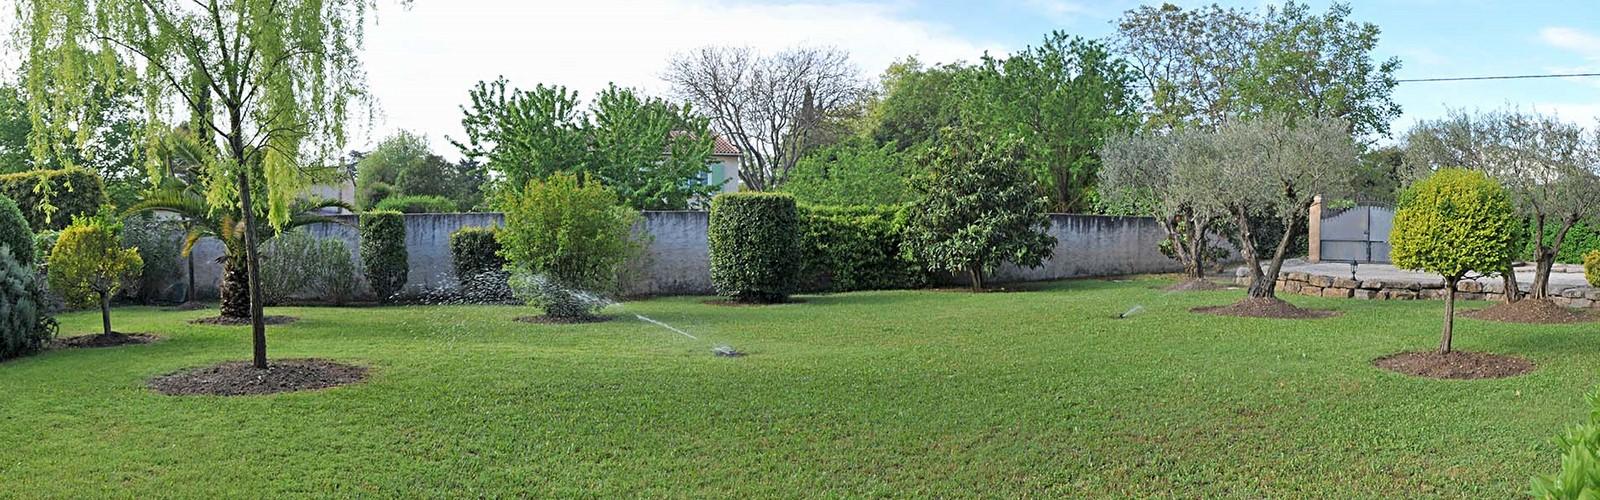 Les jardins varois flayosc for Entretien de jardins 08300